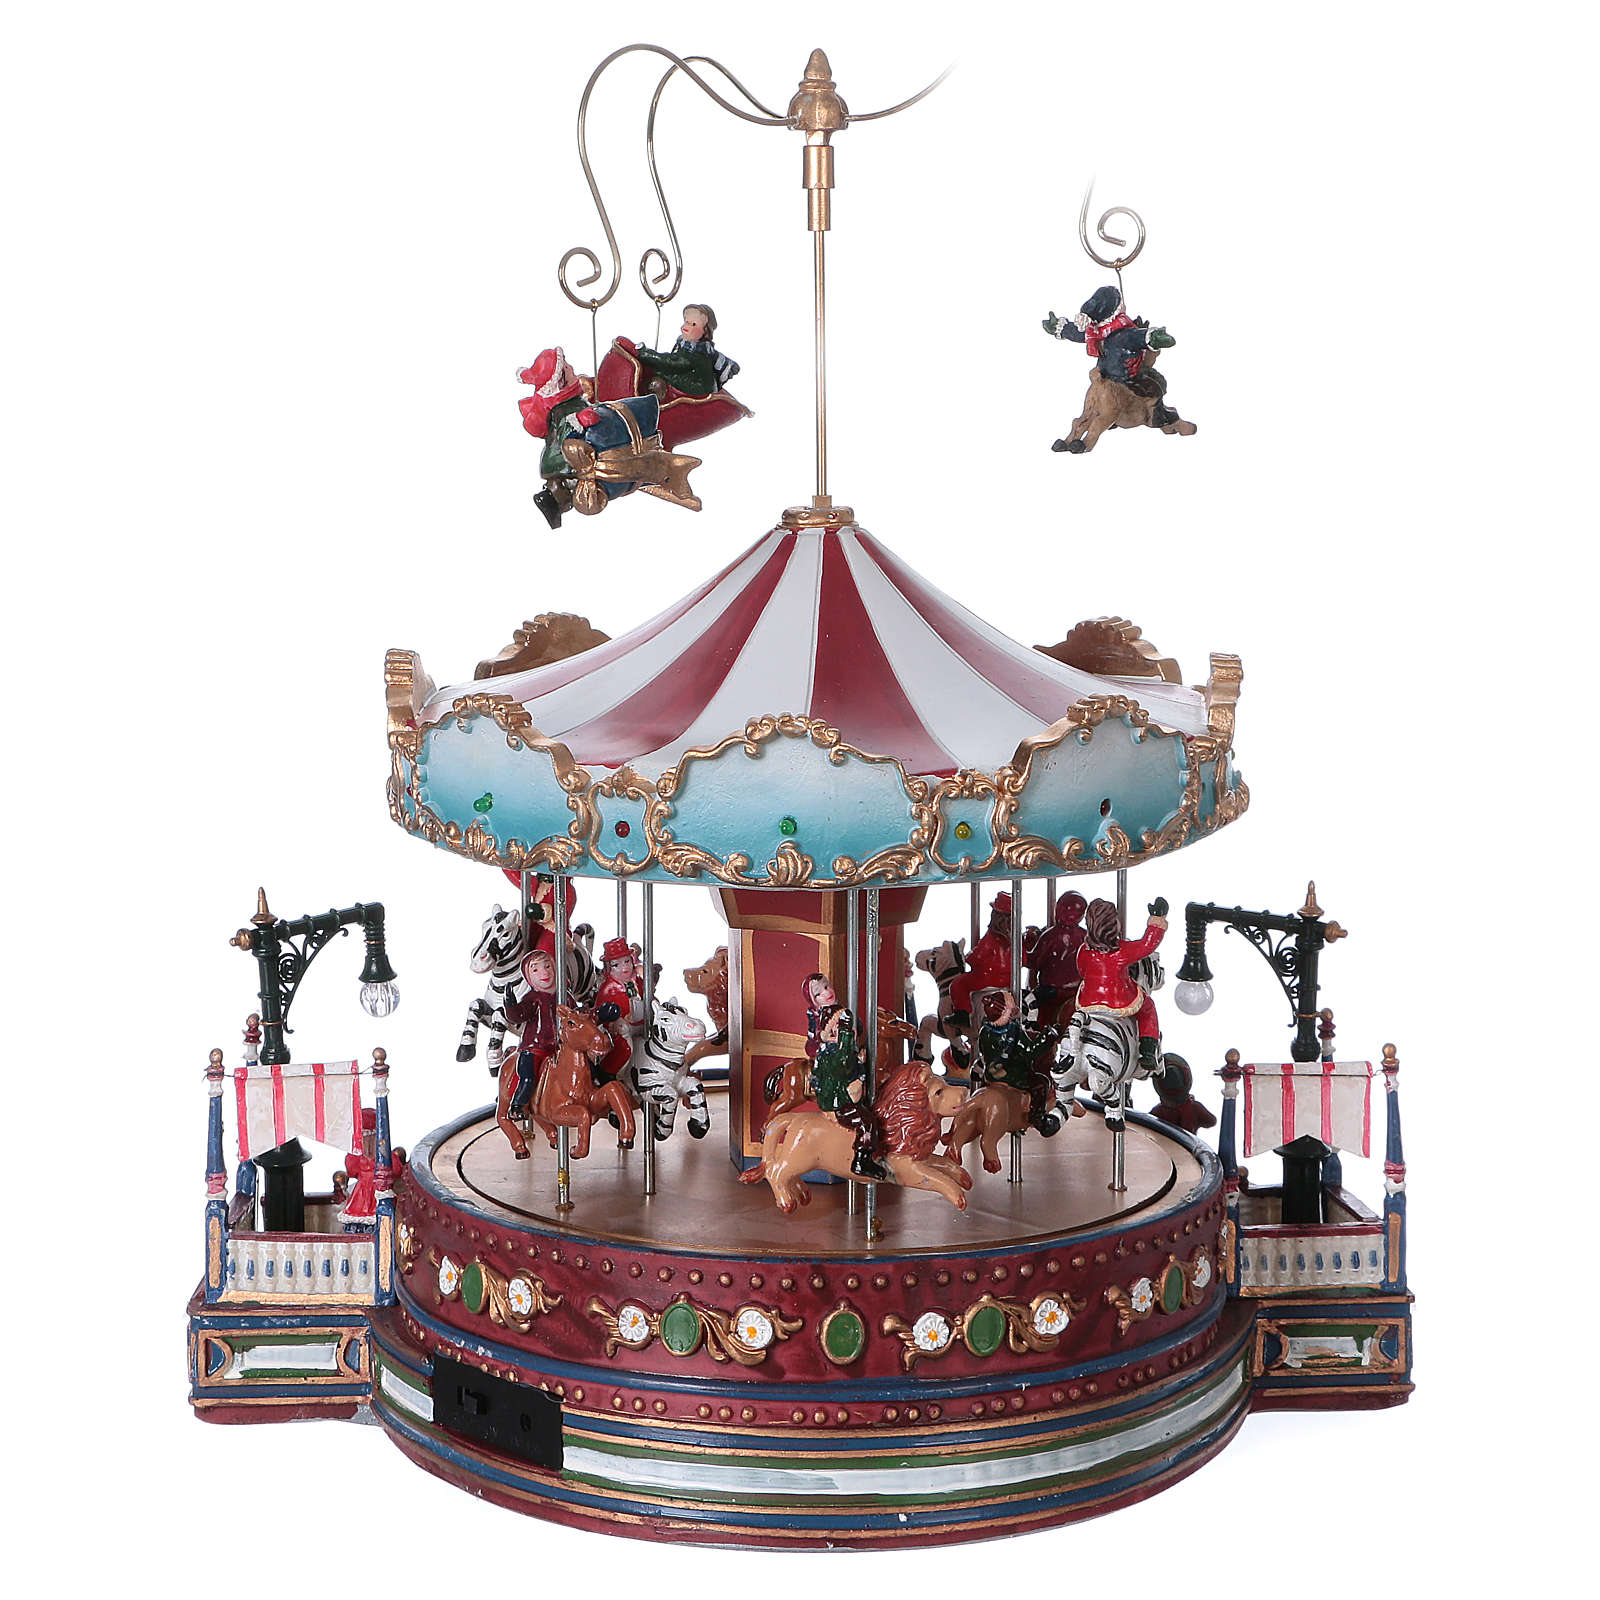 Carrusel navideño en movimiento 25x30x25 cm 3